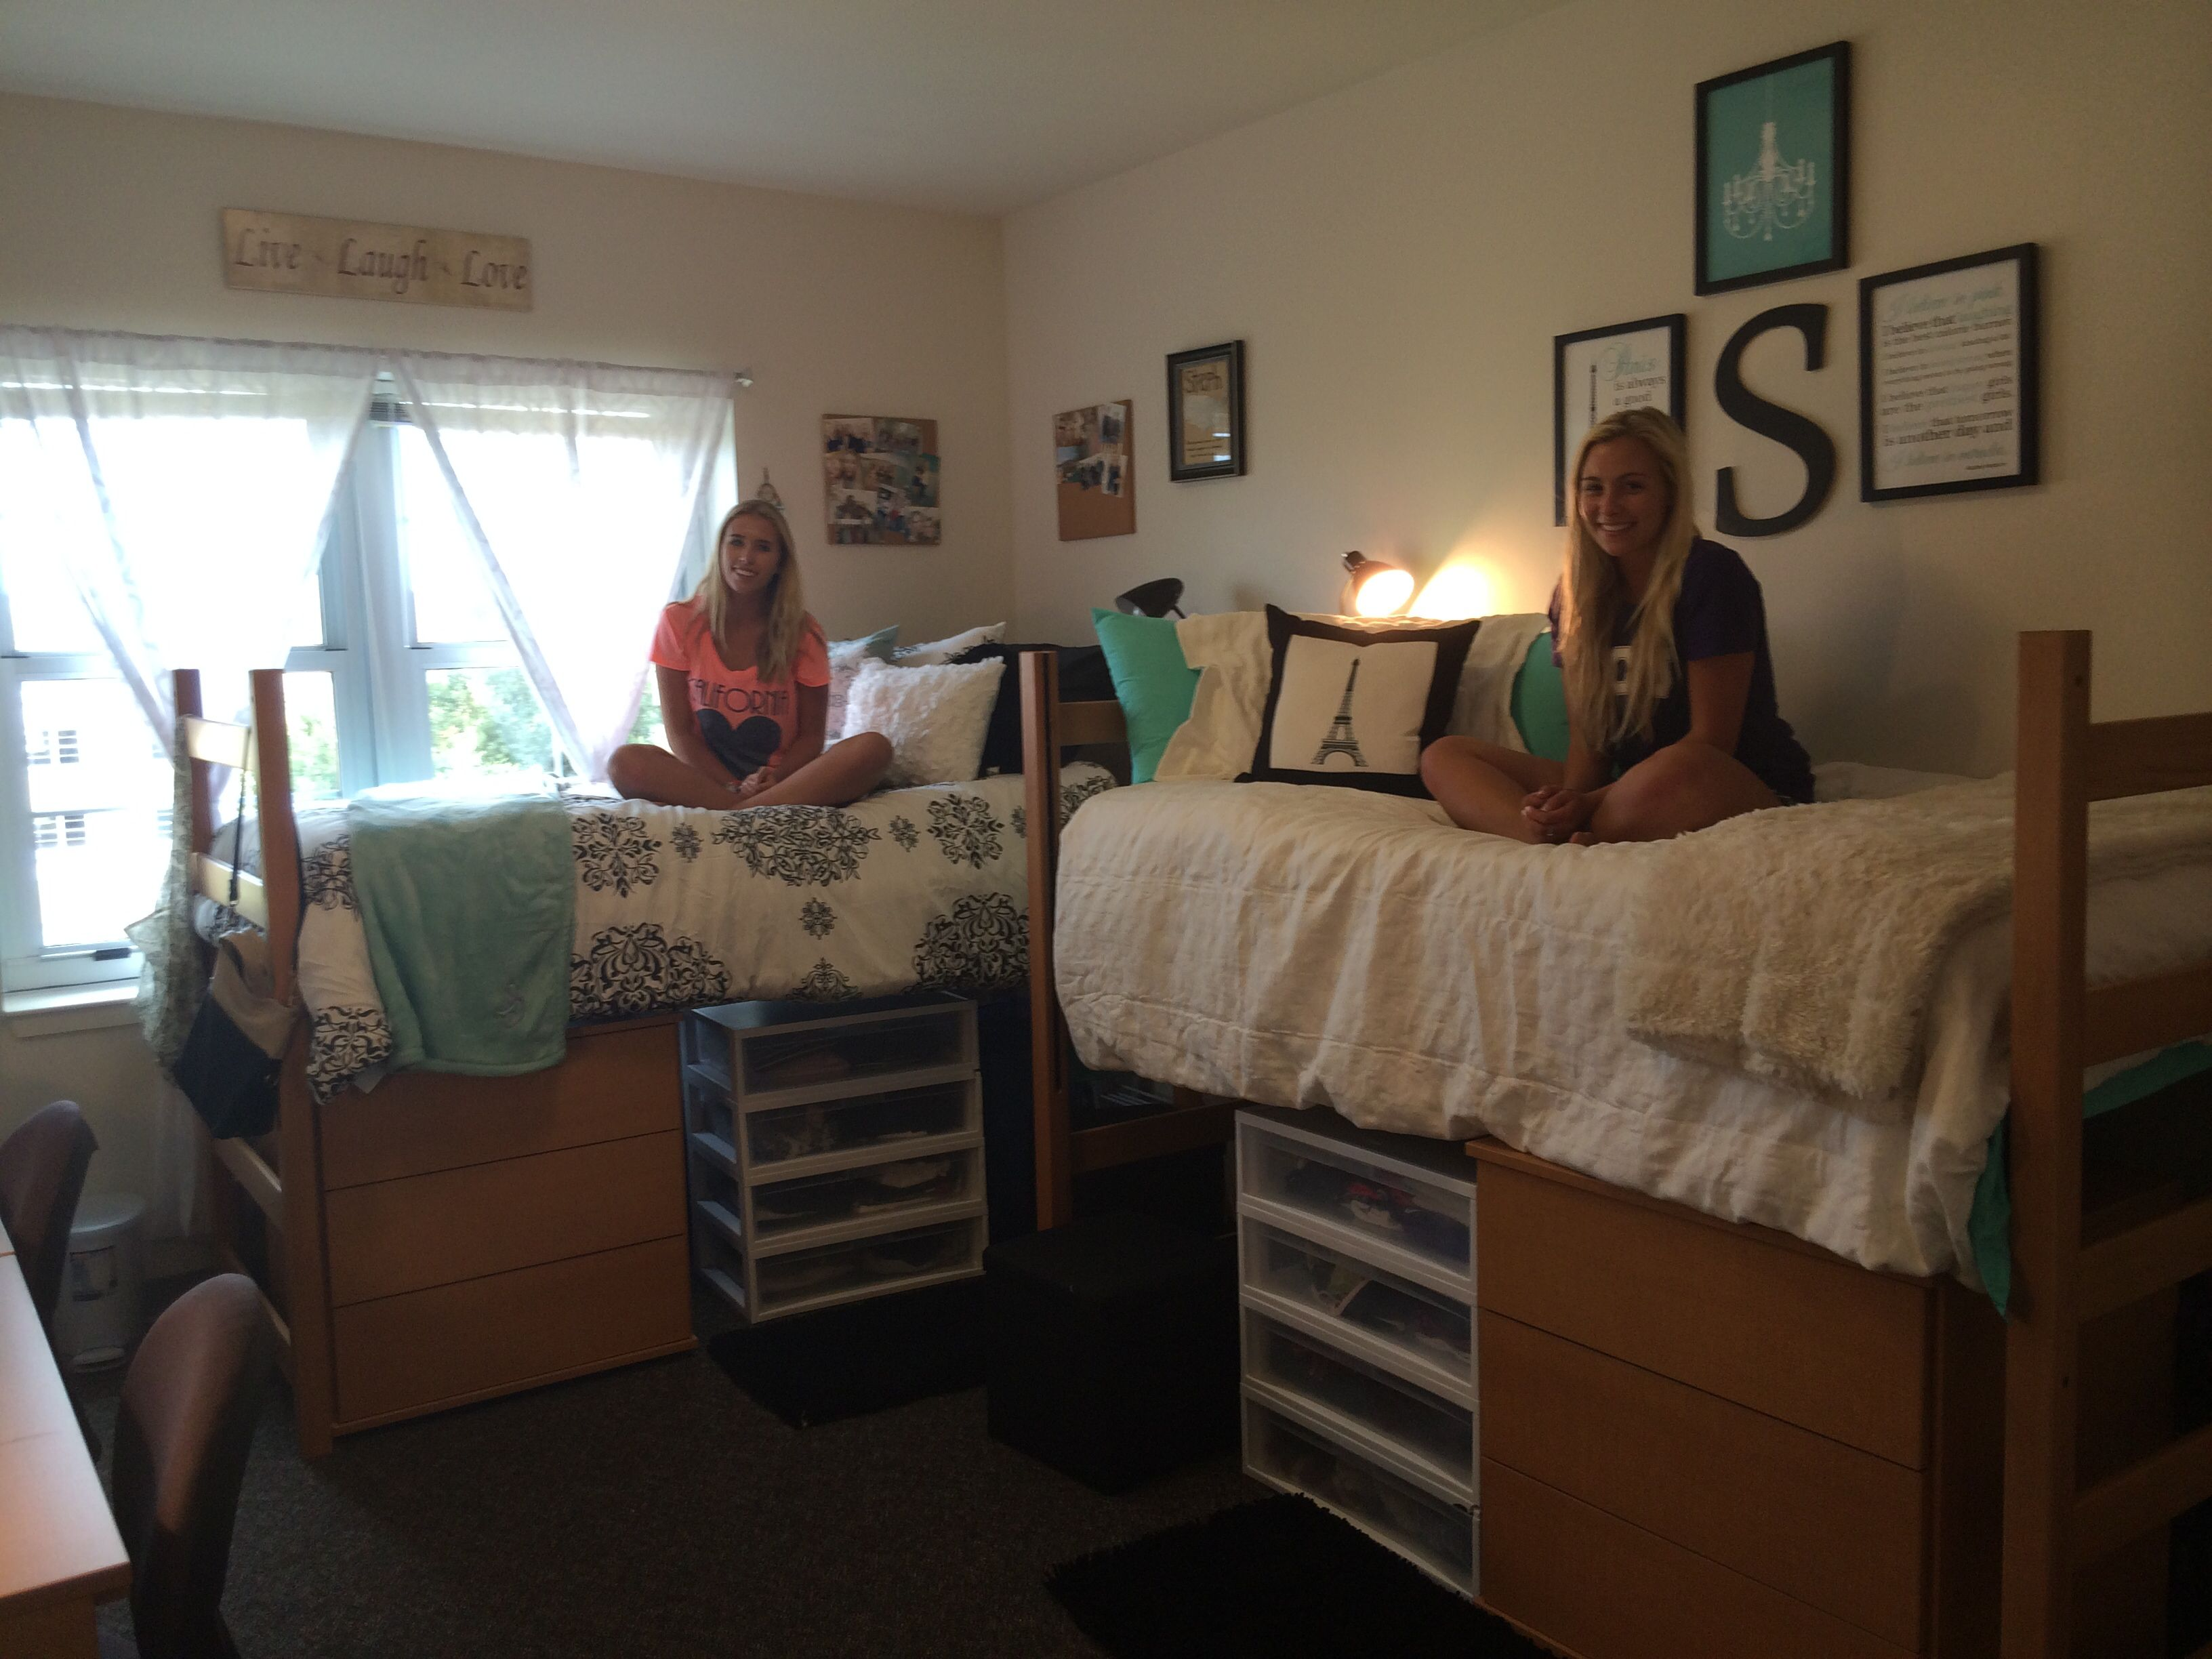 Organized and spacious dorm room. Tcu Sherley hall | Dorm ...